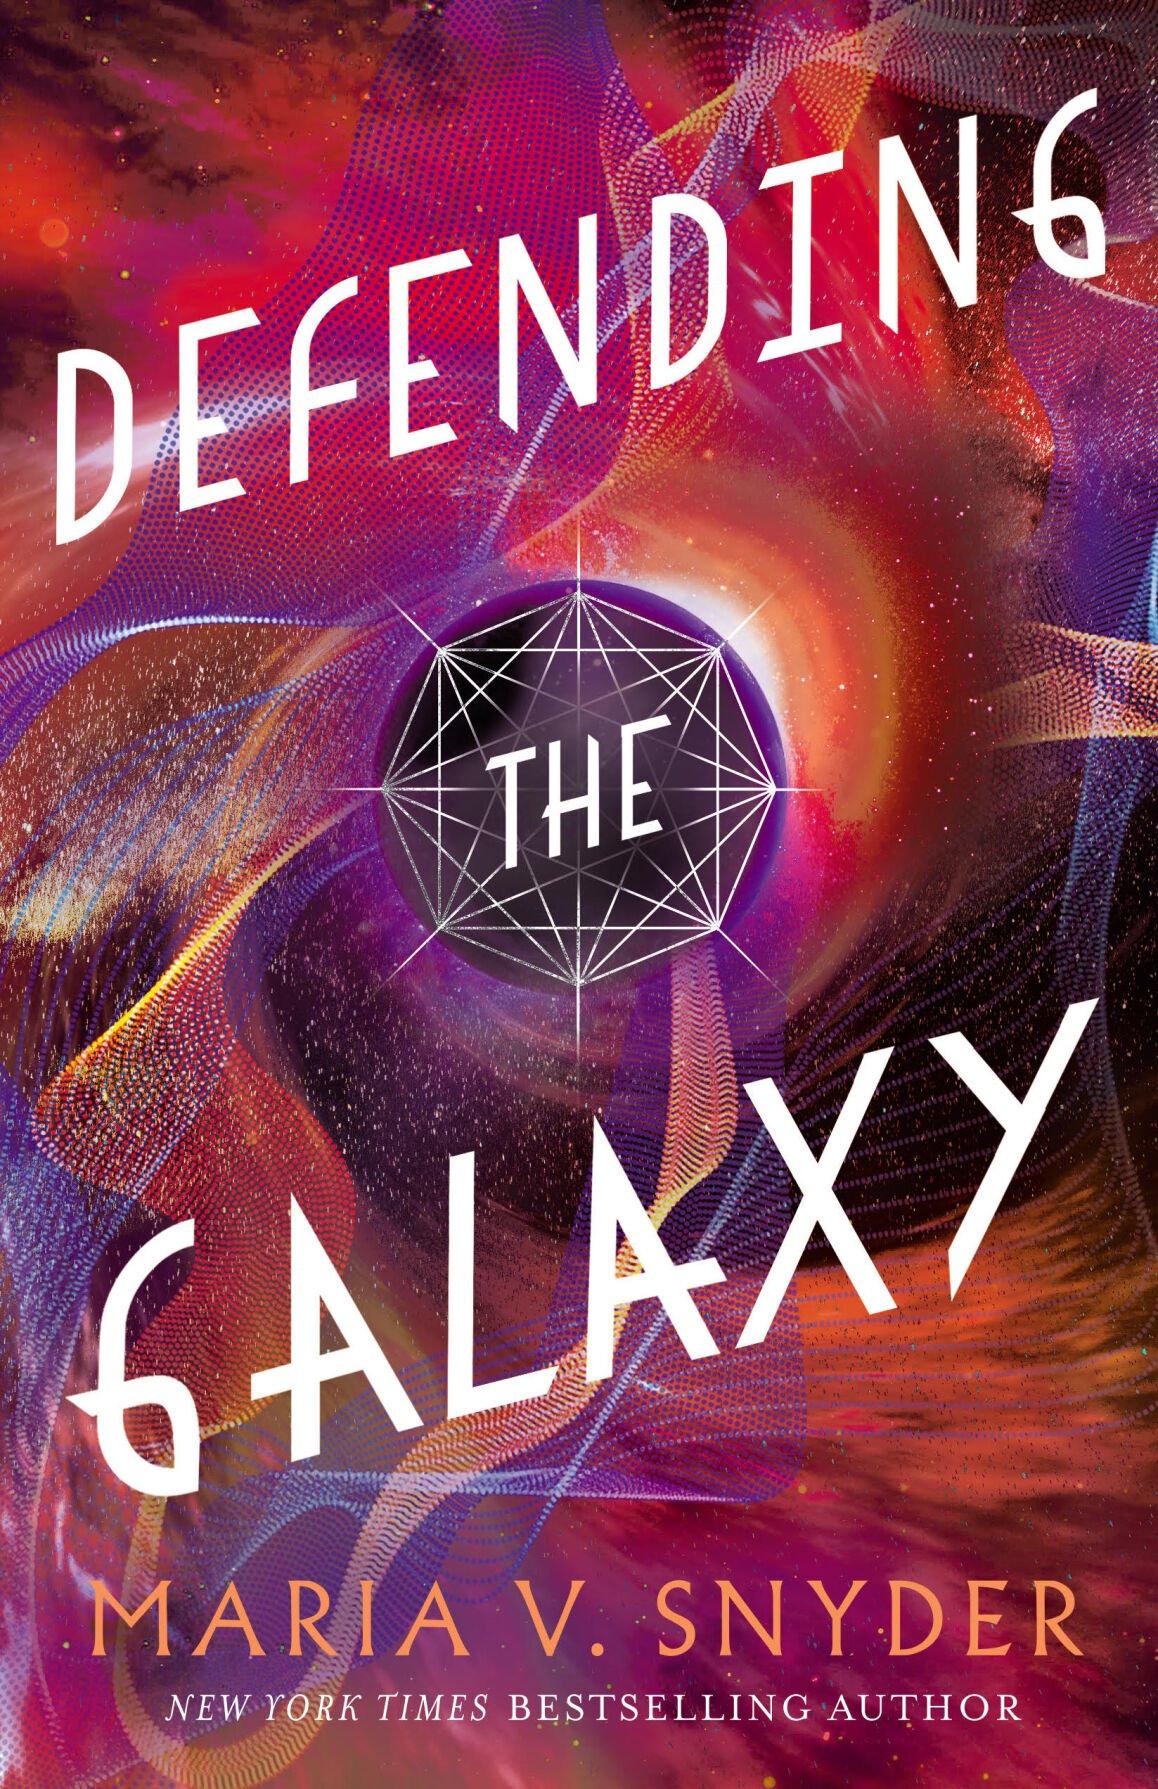 Defending the Galaxy Maria V. Snyder